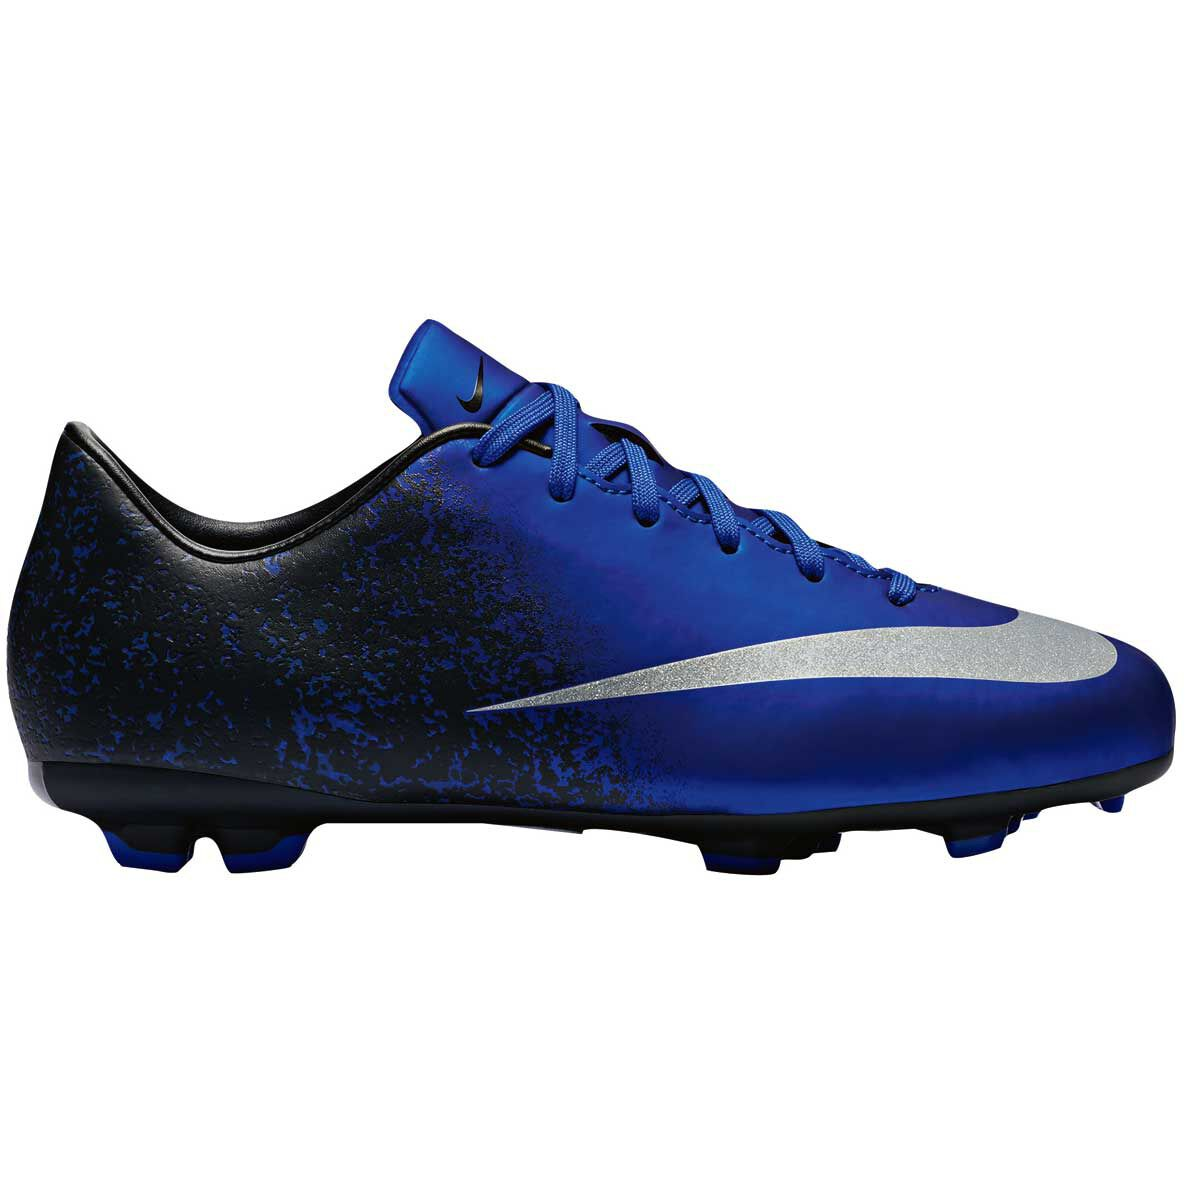 9b380e48e ... coupon for nike mercurial victory v cr7 kids football boots blue silver  us 11 junior blue